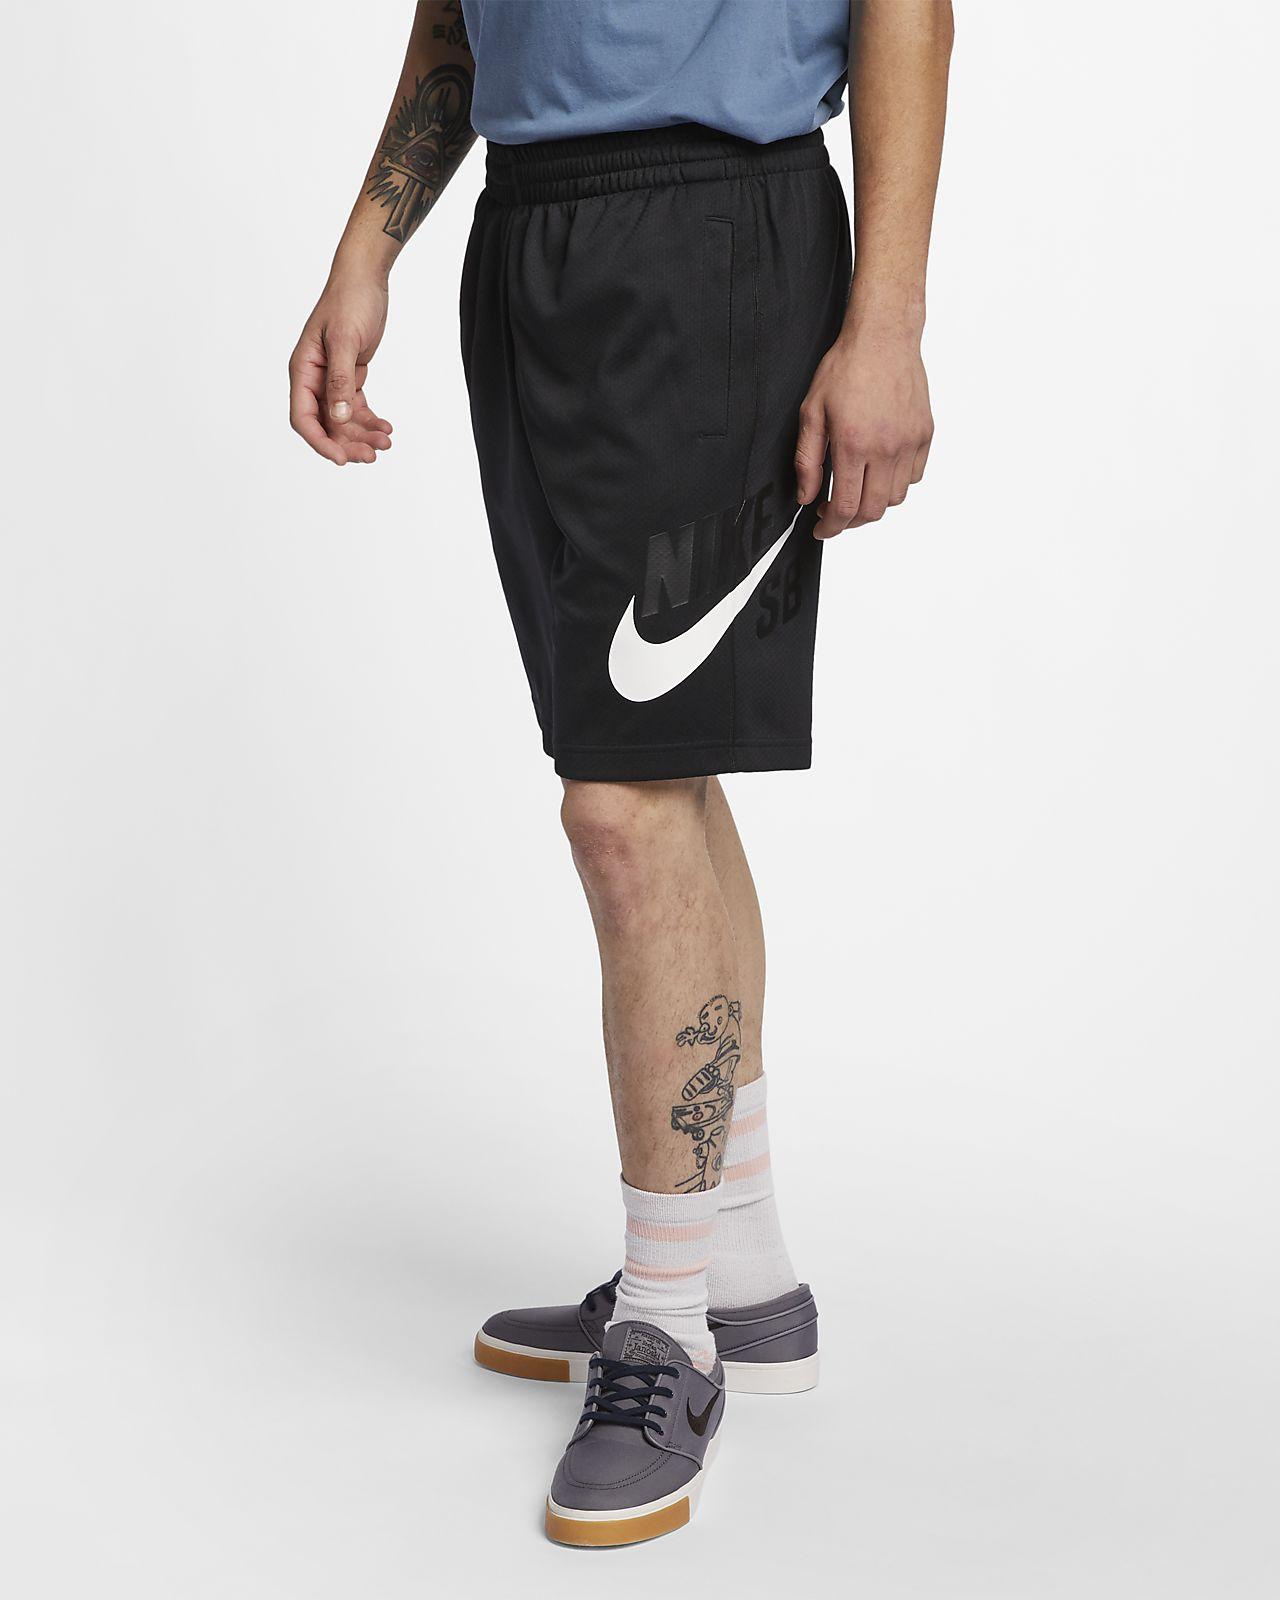 Nike SB Dri-FIT Sunday Men's Skate Shorts